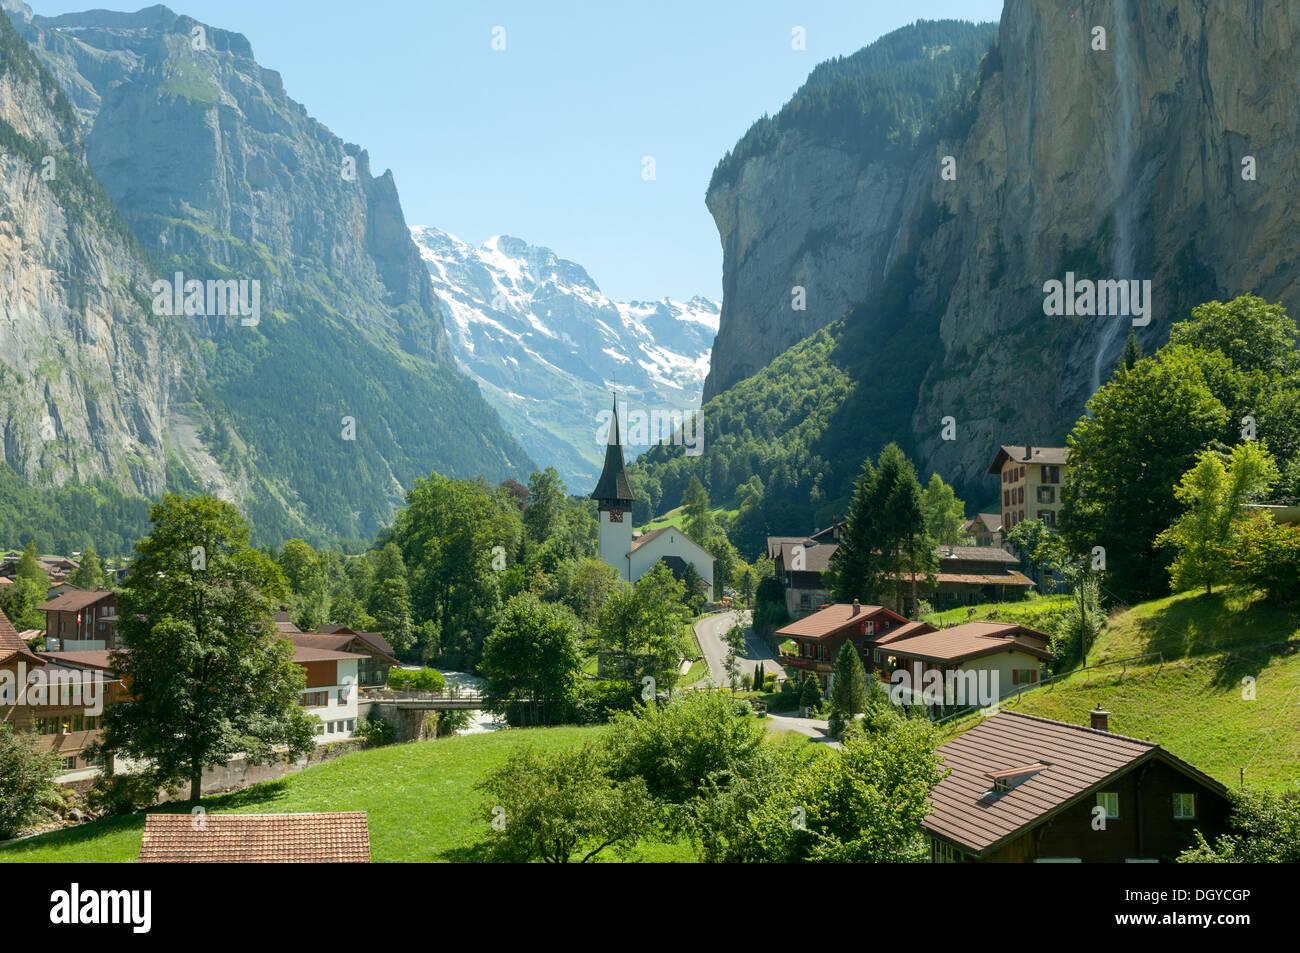 Valley of Waterfalls, Lauterbrunnen, Switzerland - Stock Image